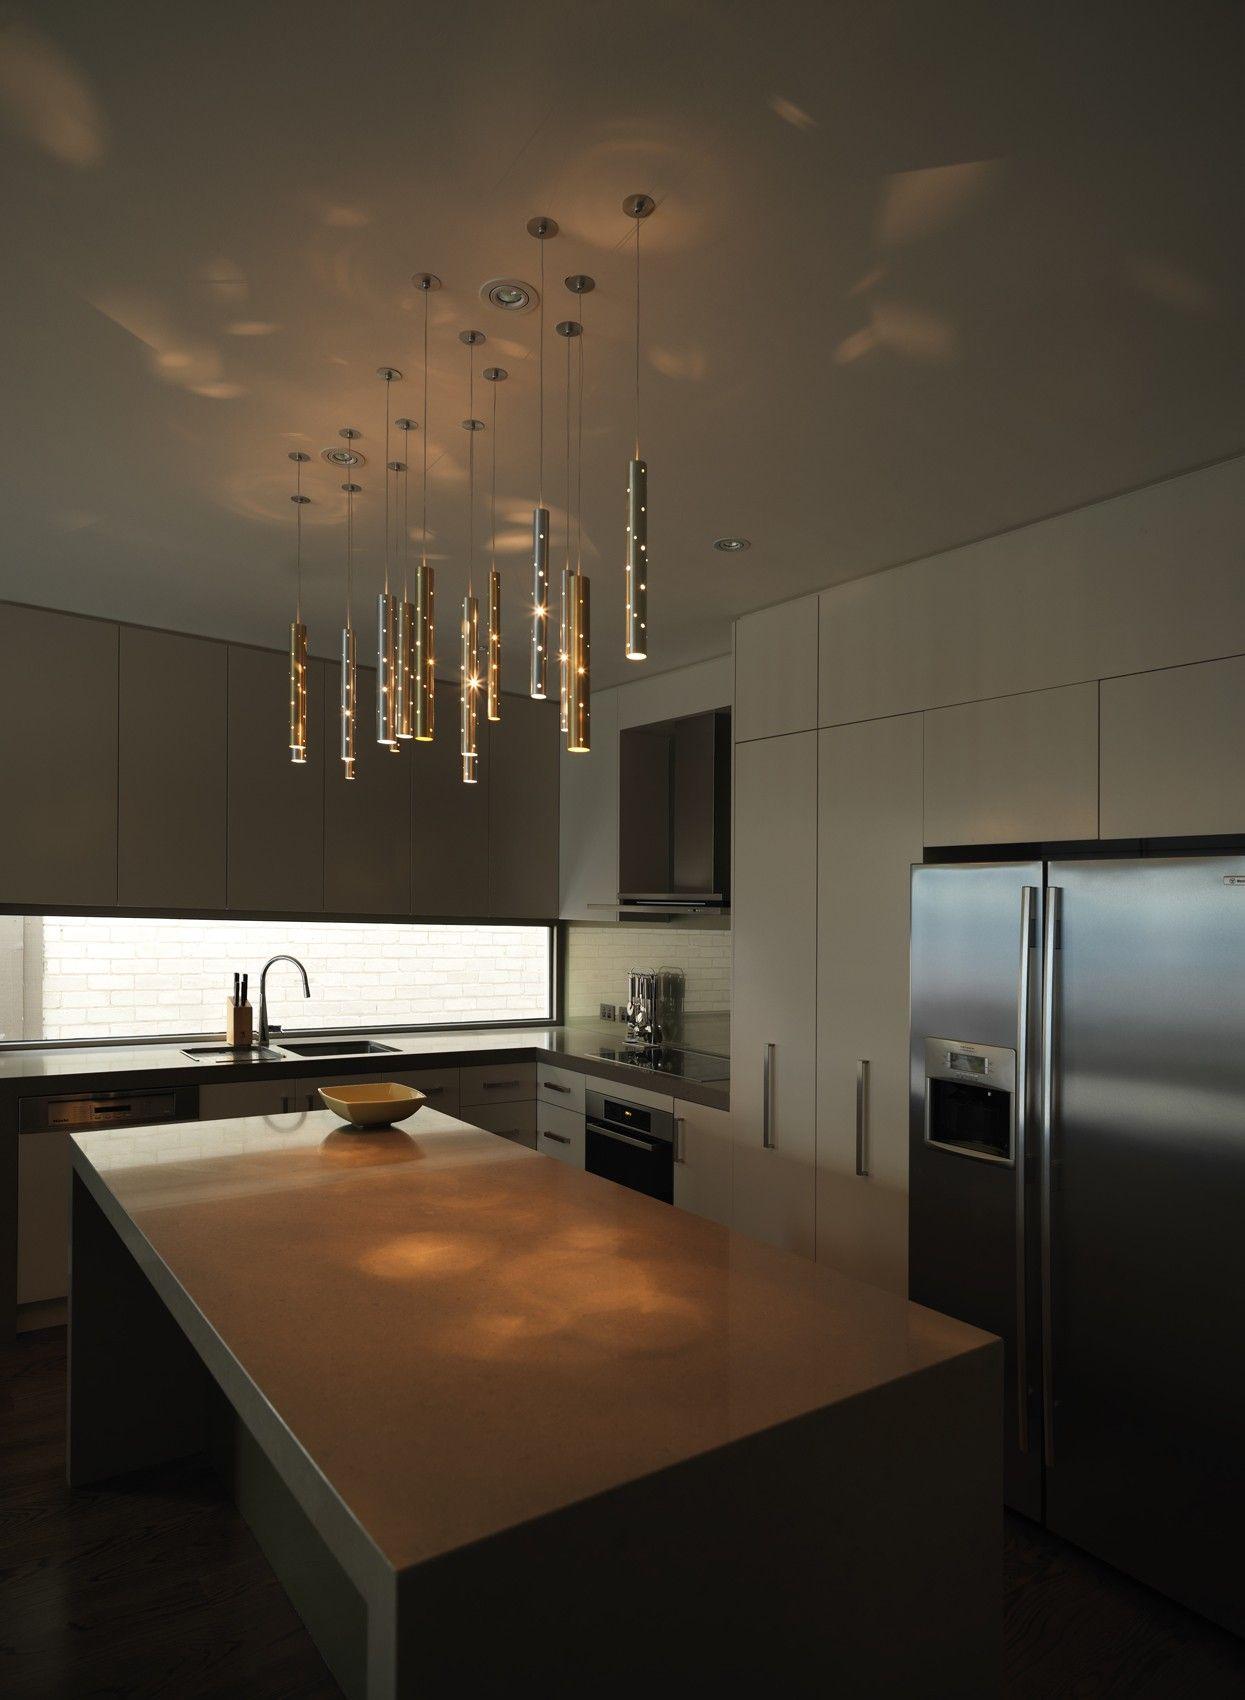 Lamp Blue Hanging Lights Glass Pendant Australia White Kitchen Multi Light Cheap